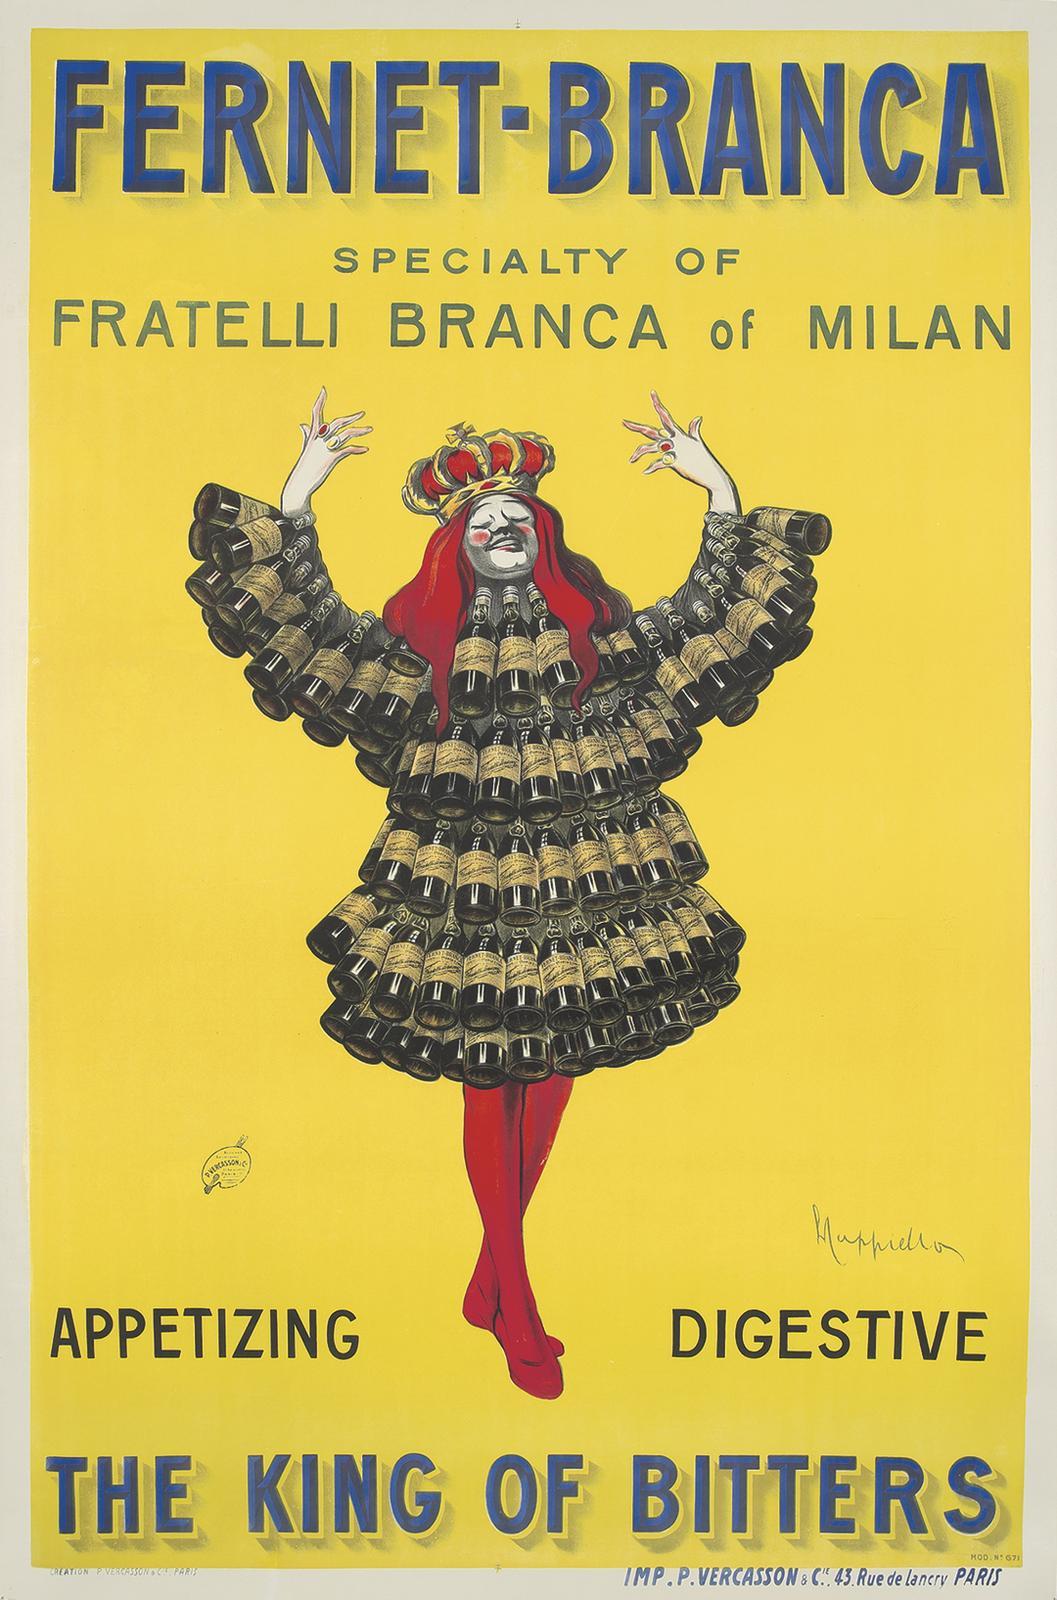 Fernet-Branca / The King of Bitters  1909    Rennert's Gallery